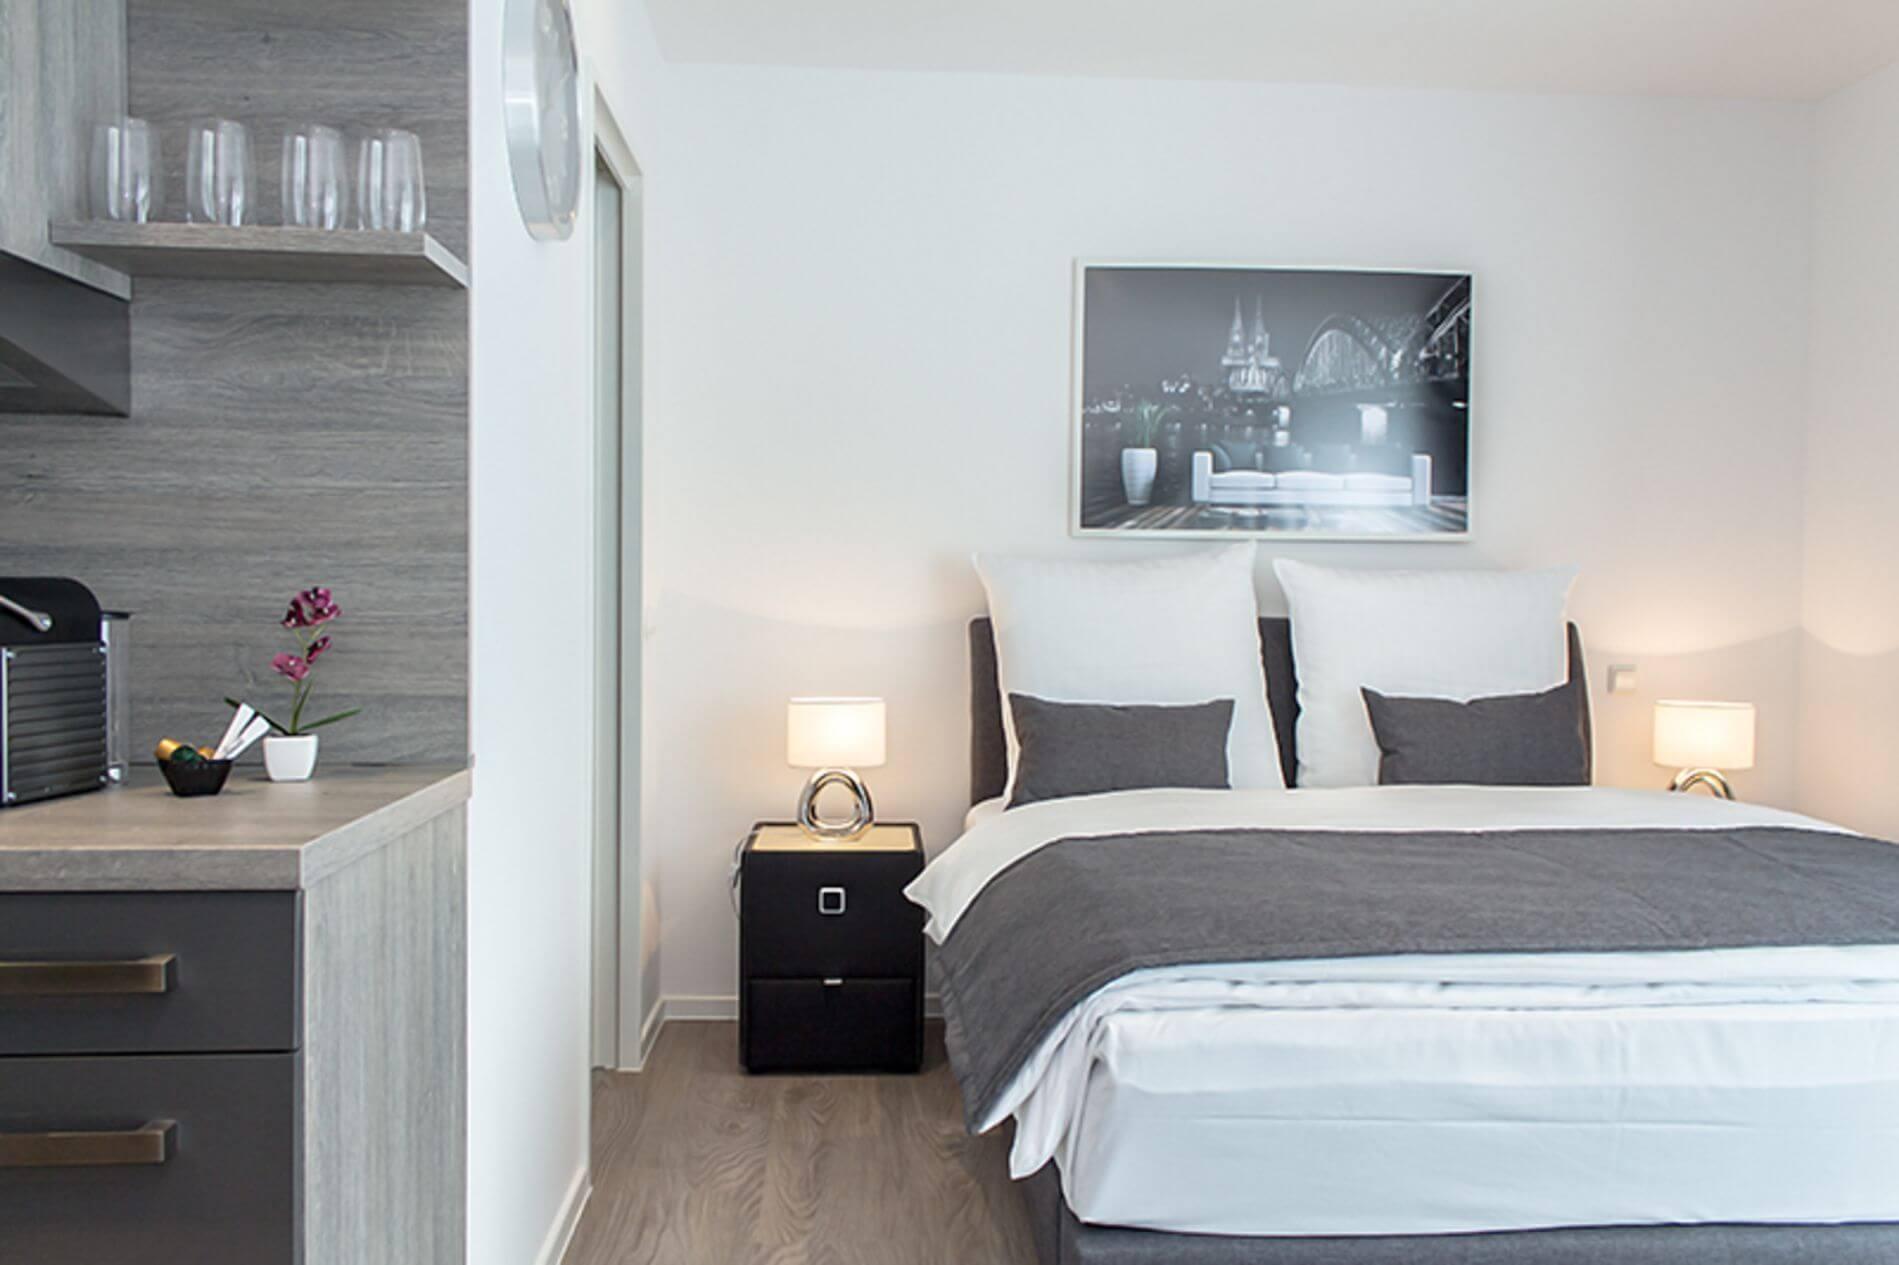 Studio apartment for rent in Cologne Friesenplatz